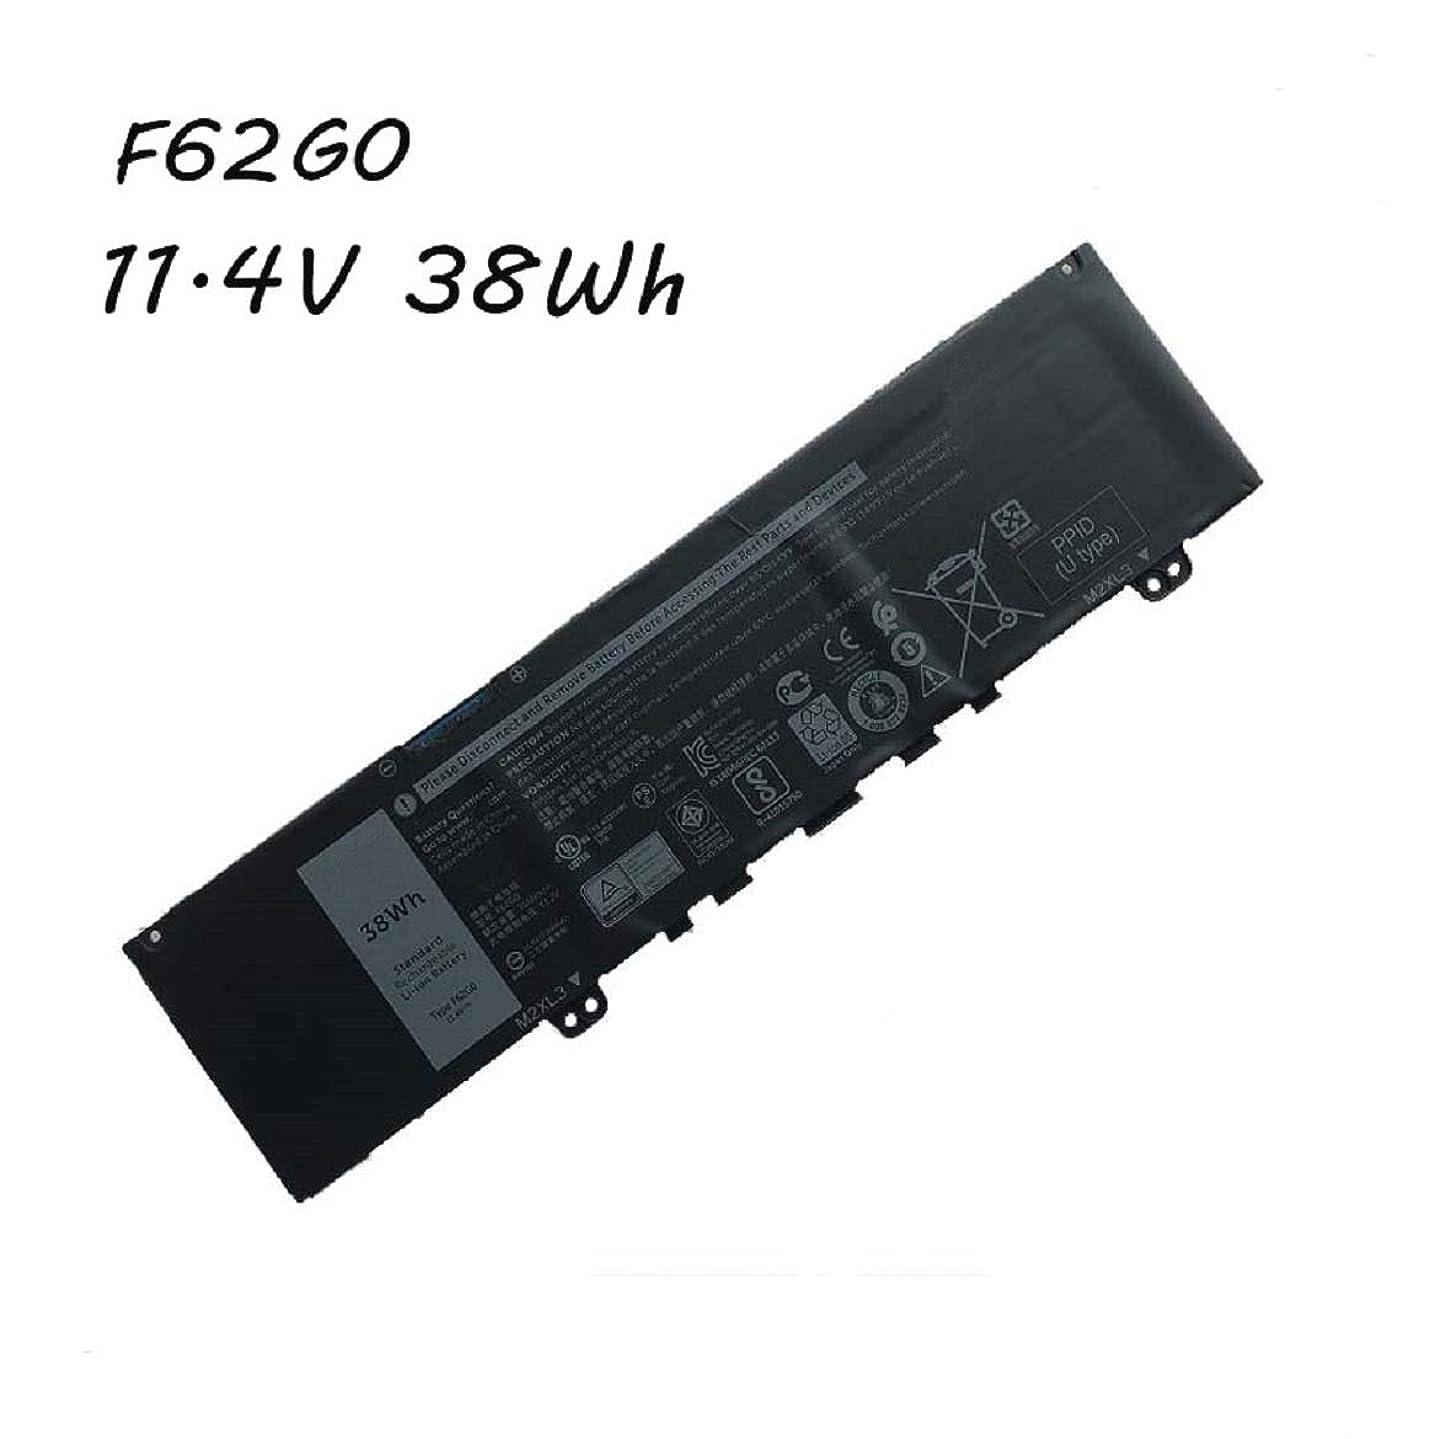 Dentsing 11.4V 38Wh 3166mAh Laptop Li-ion Battery for DELL Inspiron 7373 Vostro 13 5370 F62G0